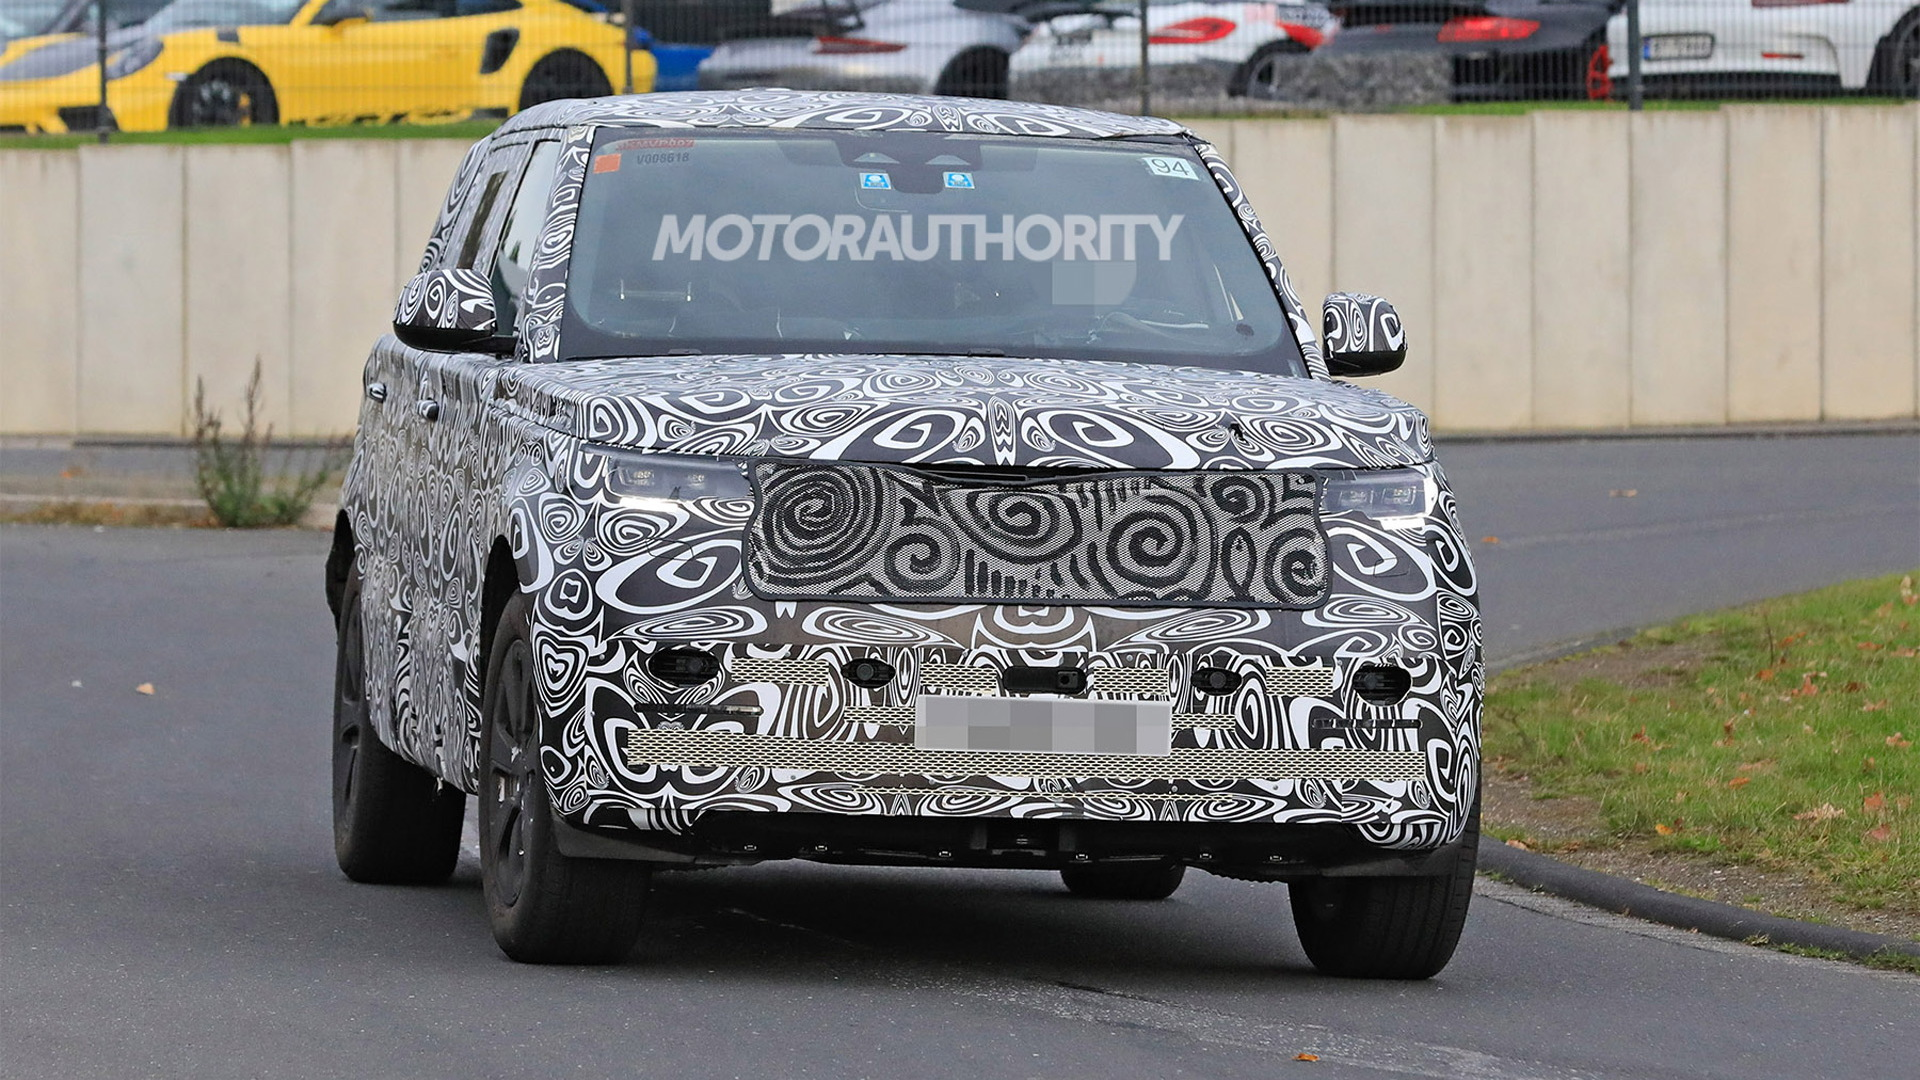 2023 Land Rover Range Rover Long Wheelbase spy shots - Photo credit: S. Baldauf/SB-Medien